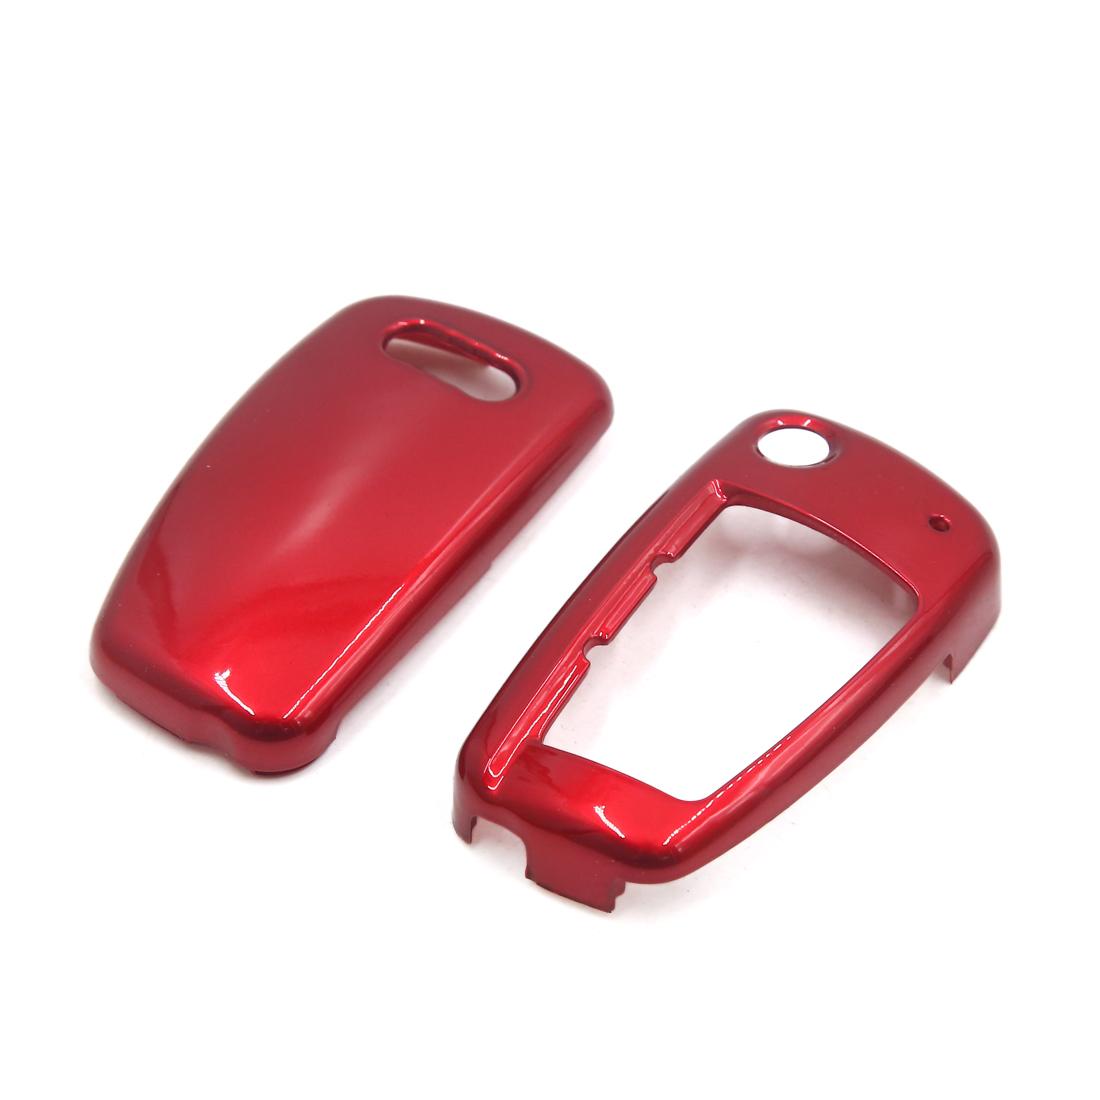 6.8 x 3.6 x 2.1cm Red Remote Key Case for Audi A3 A4 A4L A6 A6L Q3 Q5 Q7 TT R8